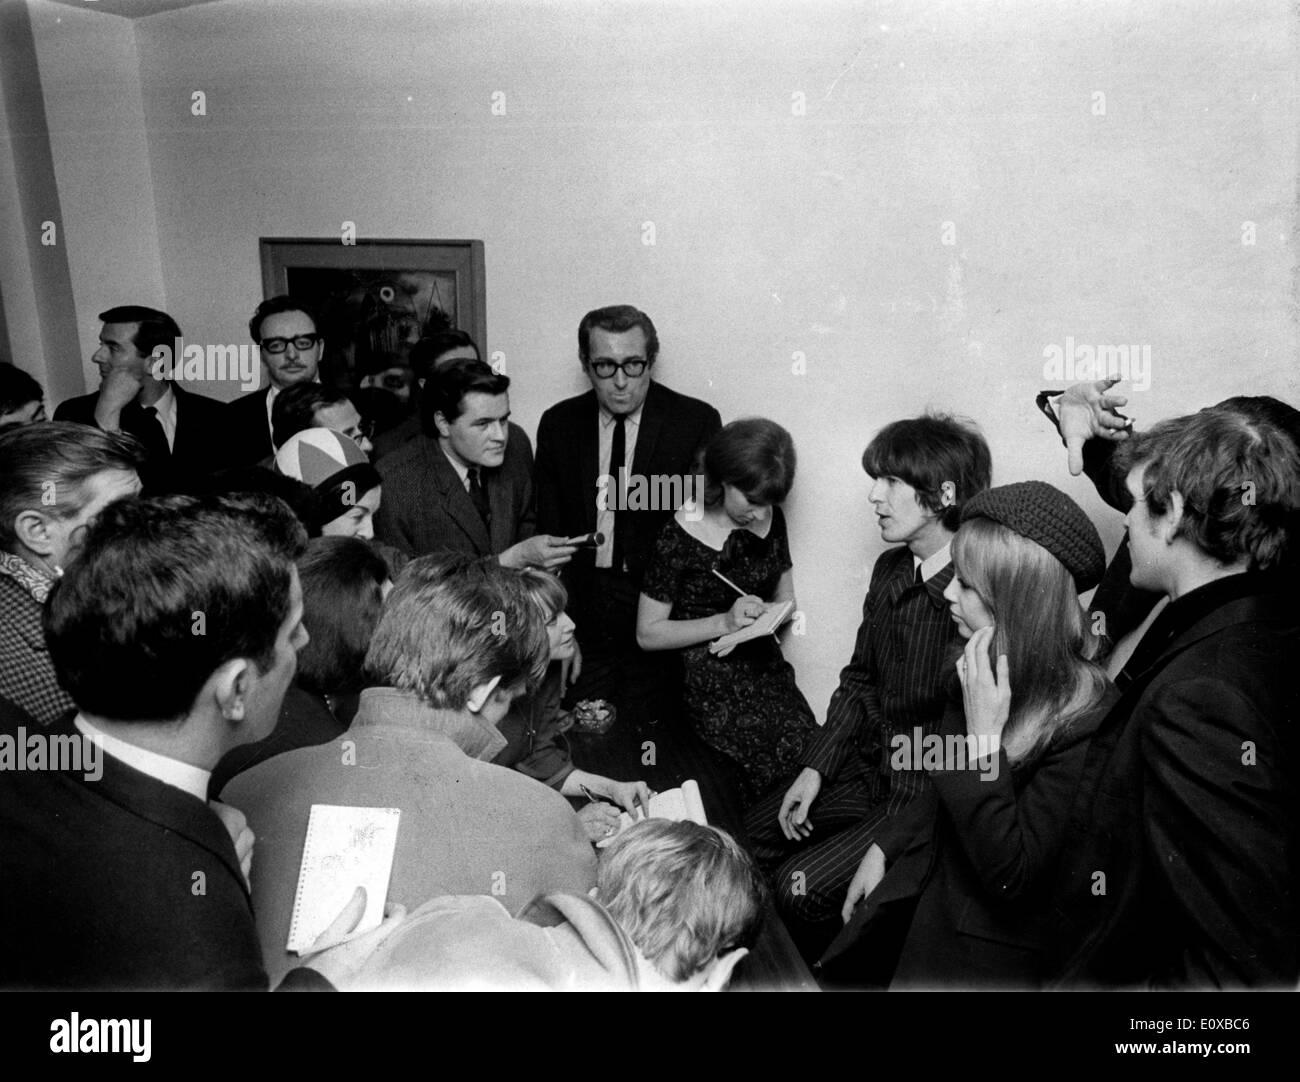 Beatles Guitarist George Harrison weds - Stock Image